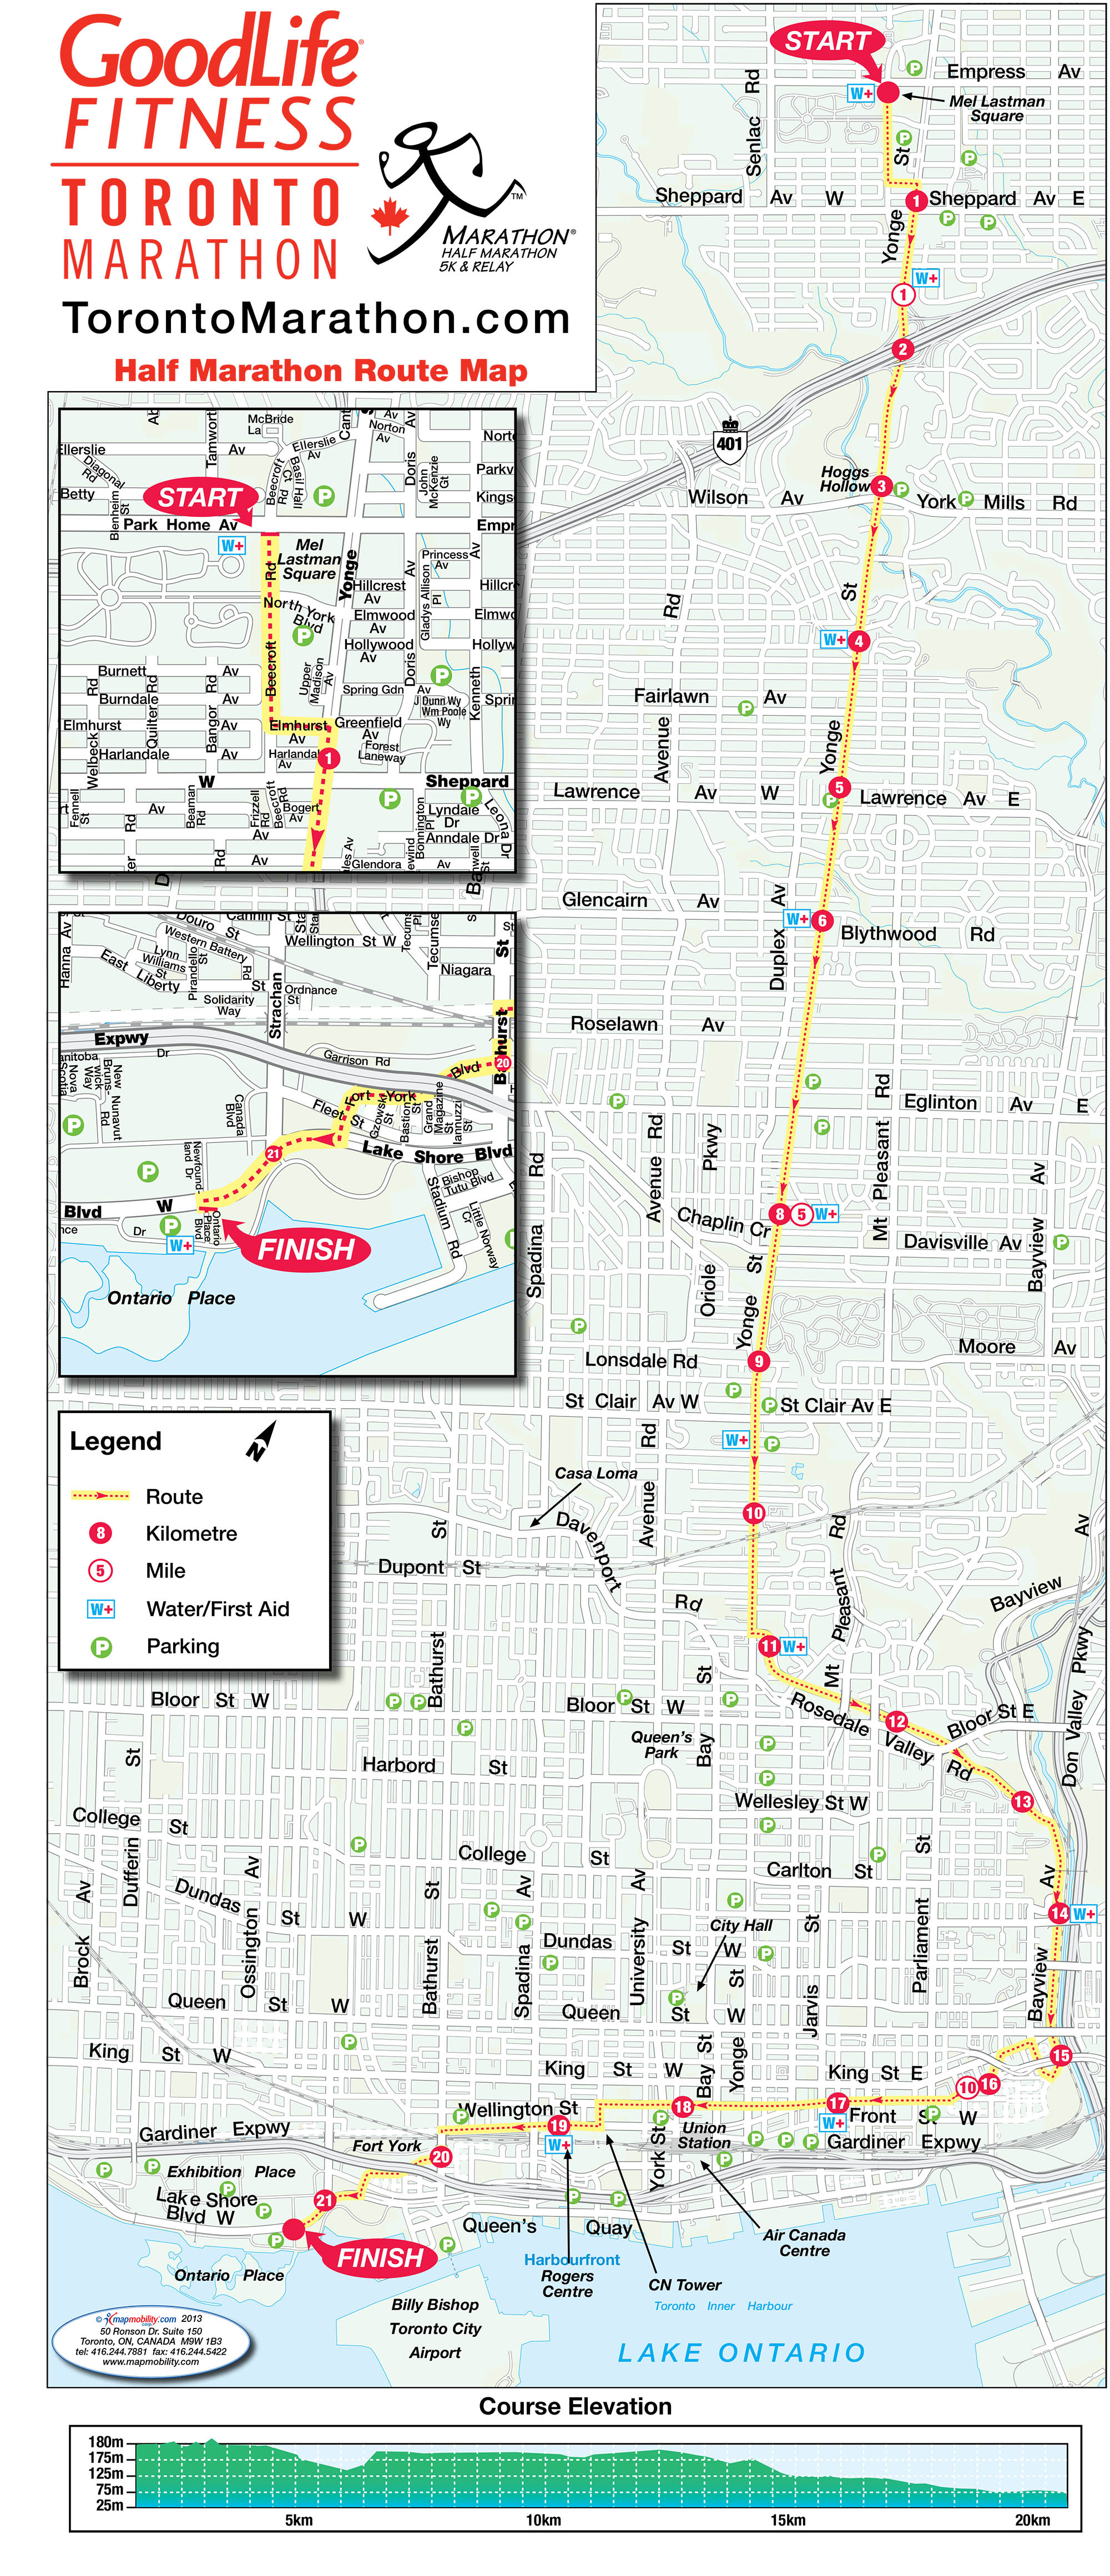 Route map for the half marathon at the 2016 GoodLife Fitness Toronto Marathon. Photo via torontomarathon.com.